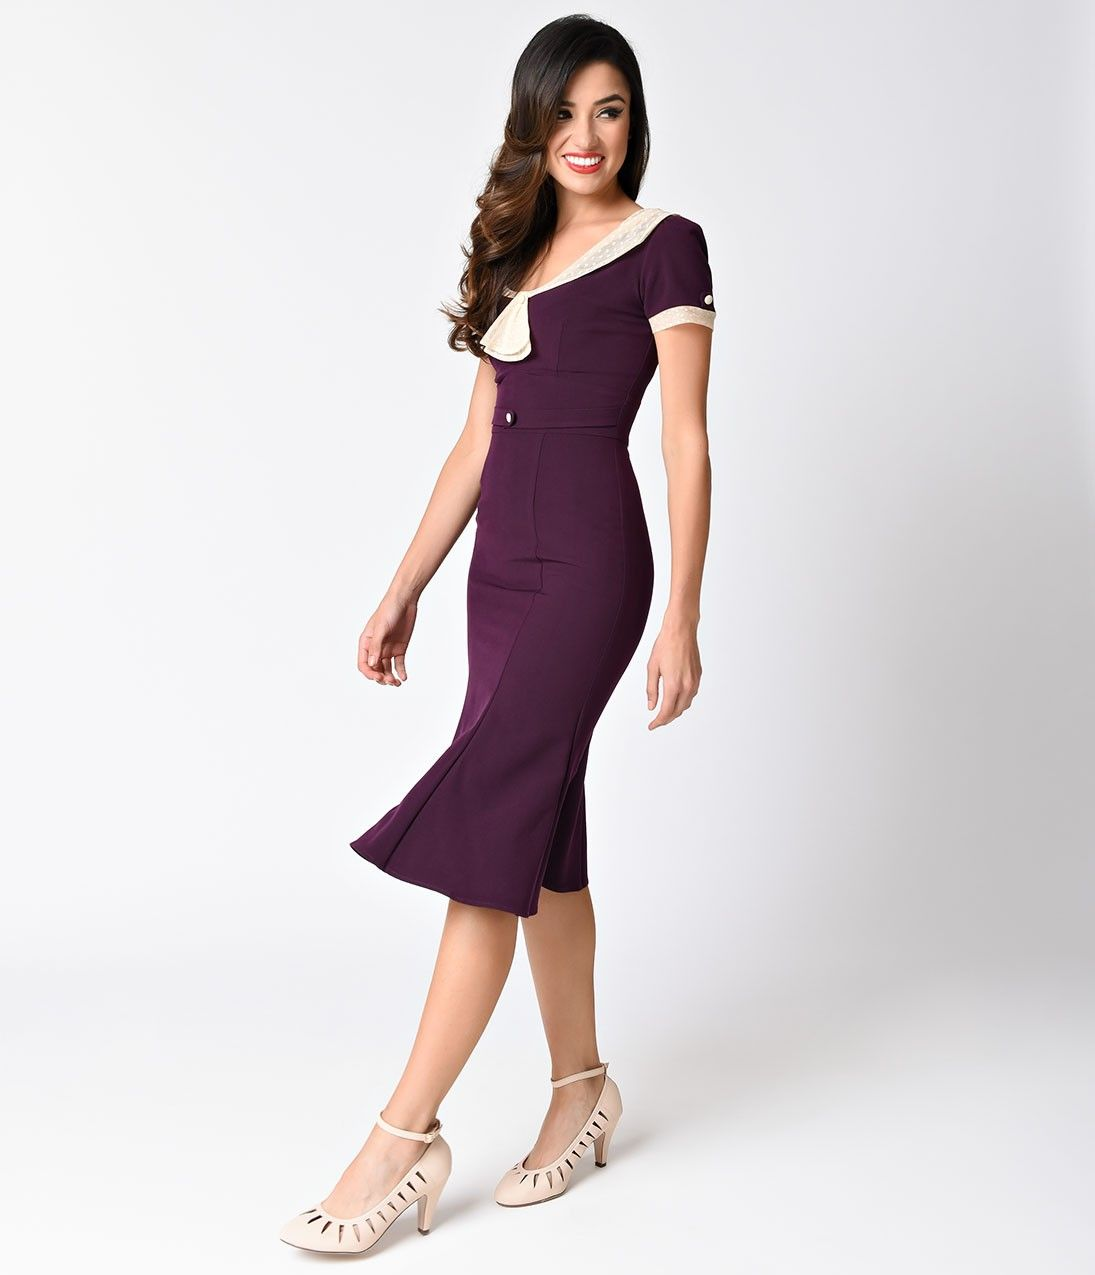 Exclusive Stop Staring! 1930s Eggplant Purple & Ivory Railene Dress ...